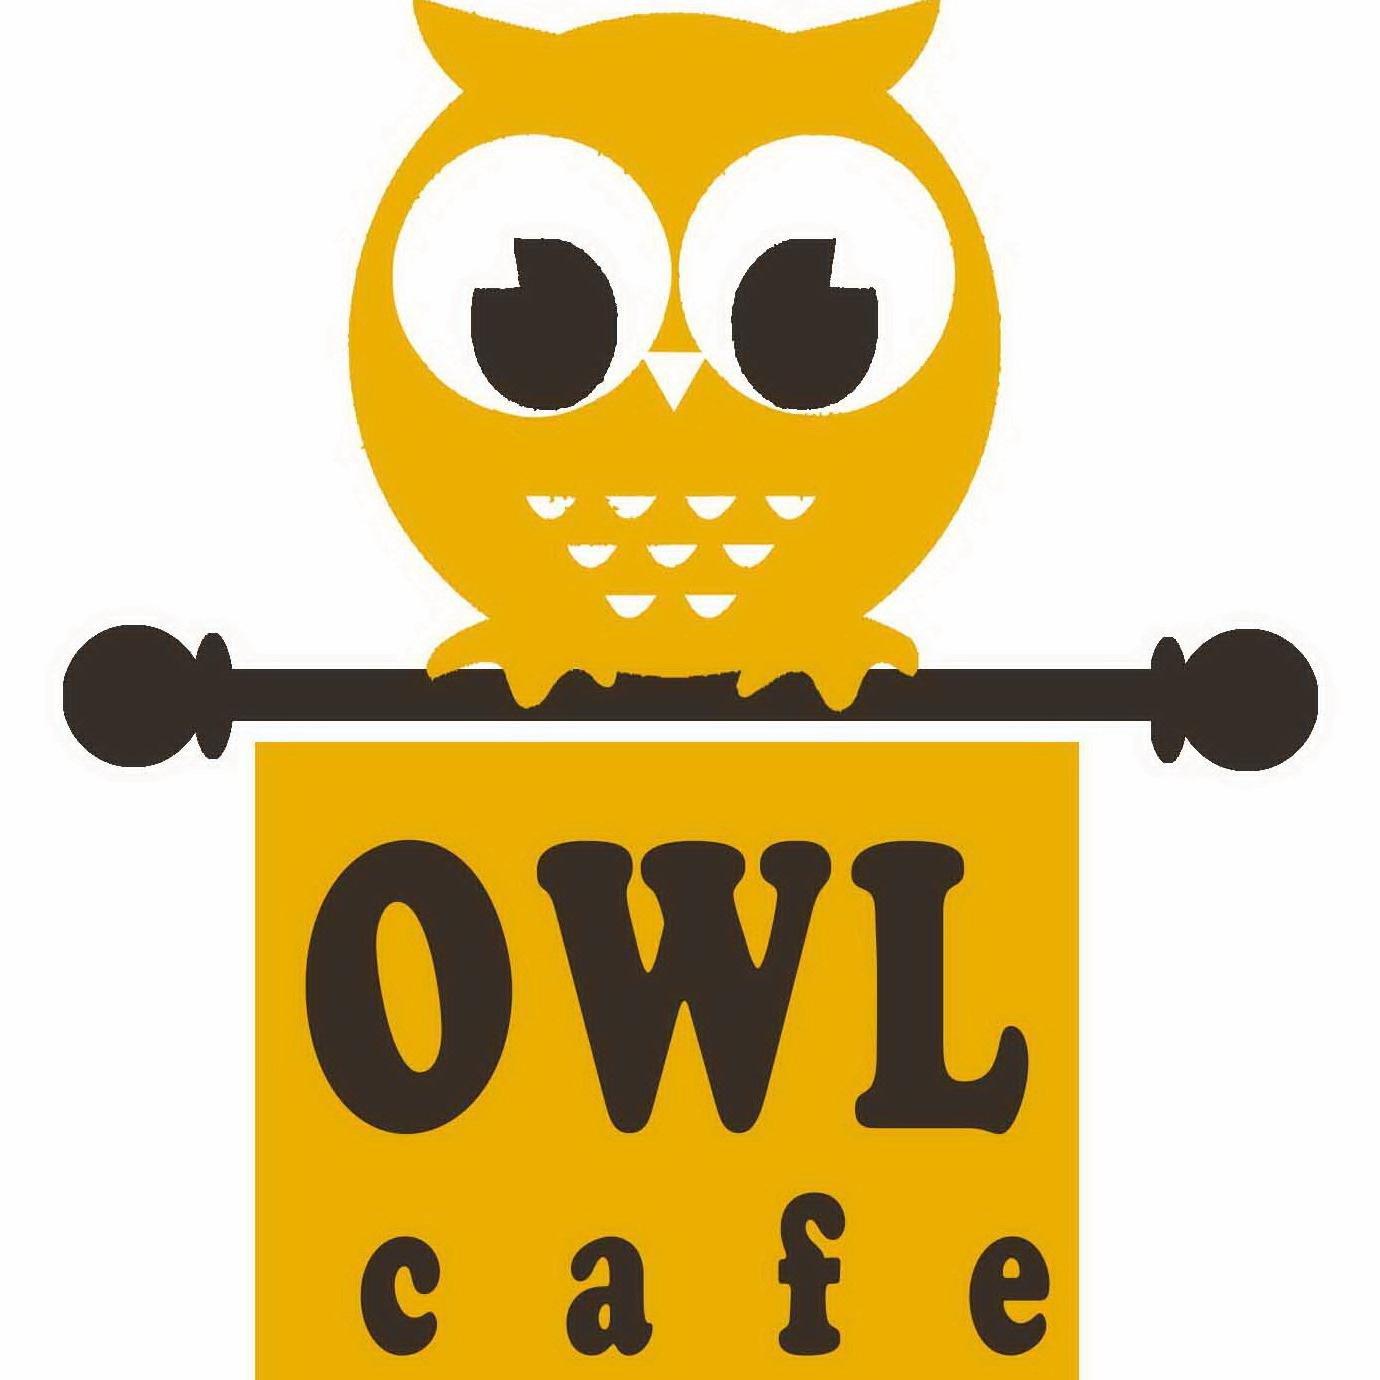 Owl Cafe Balikpapan (@Owl_Cafe_Bpn).